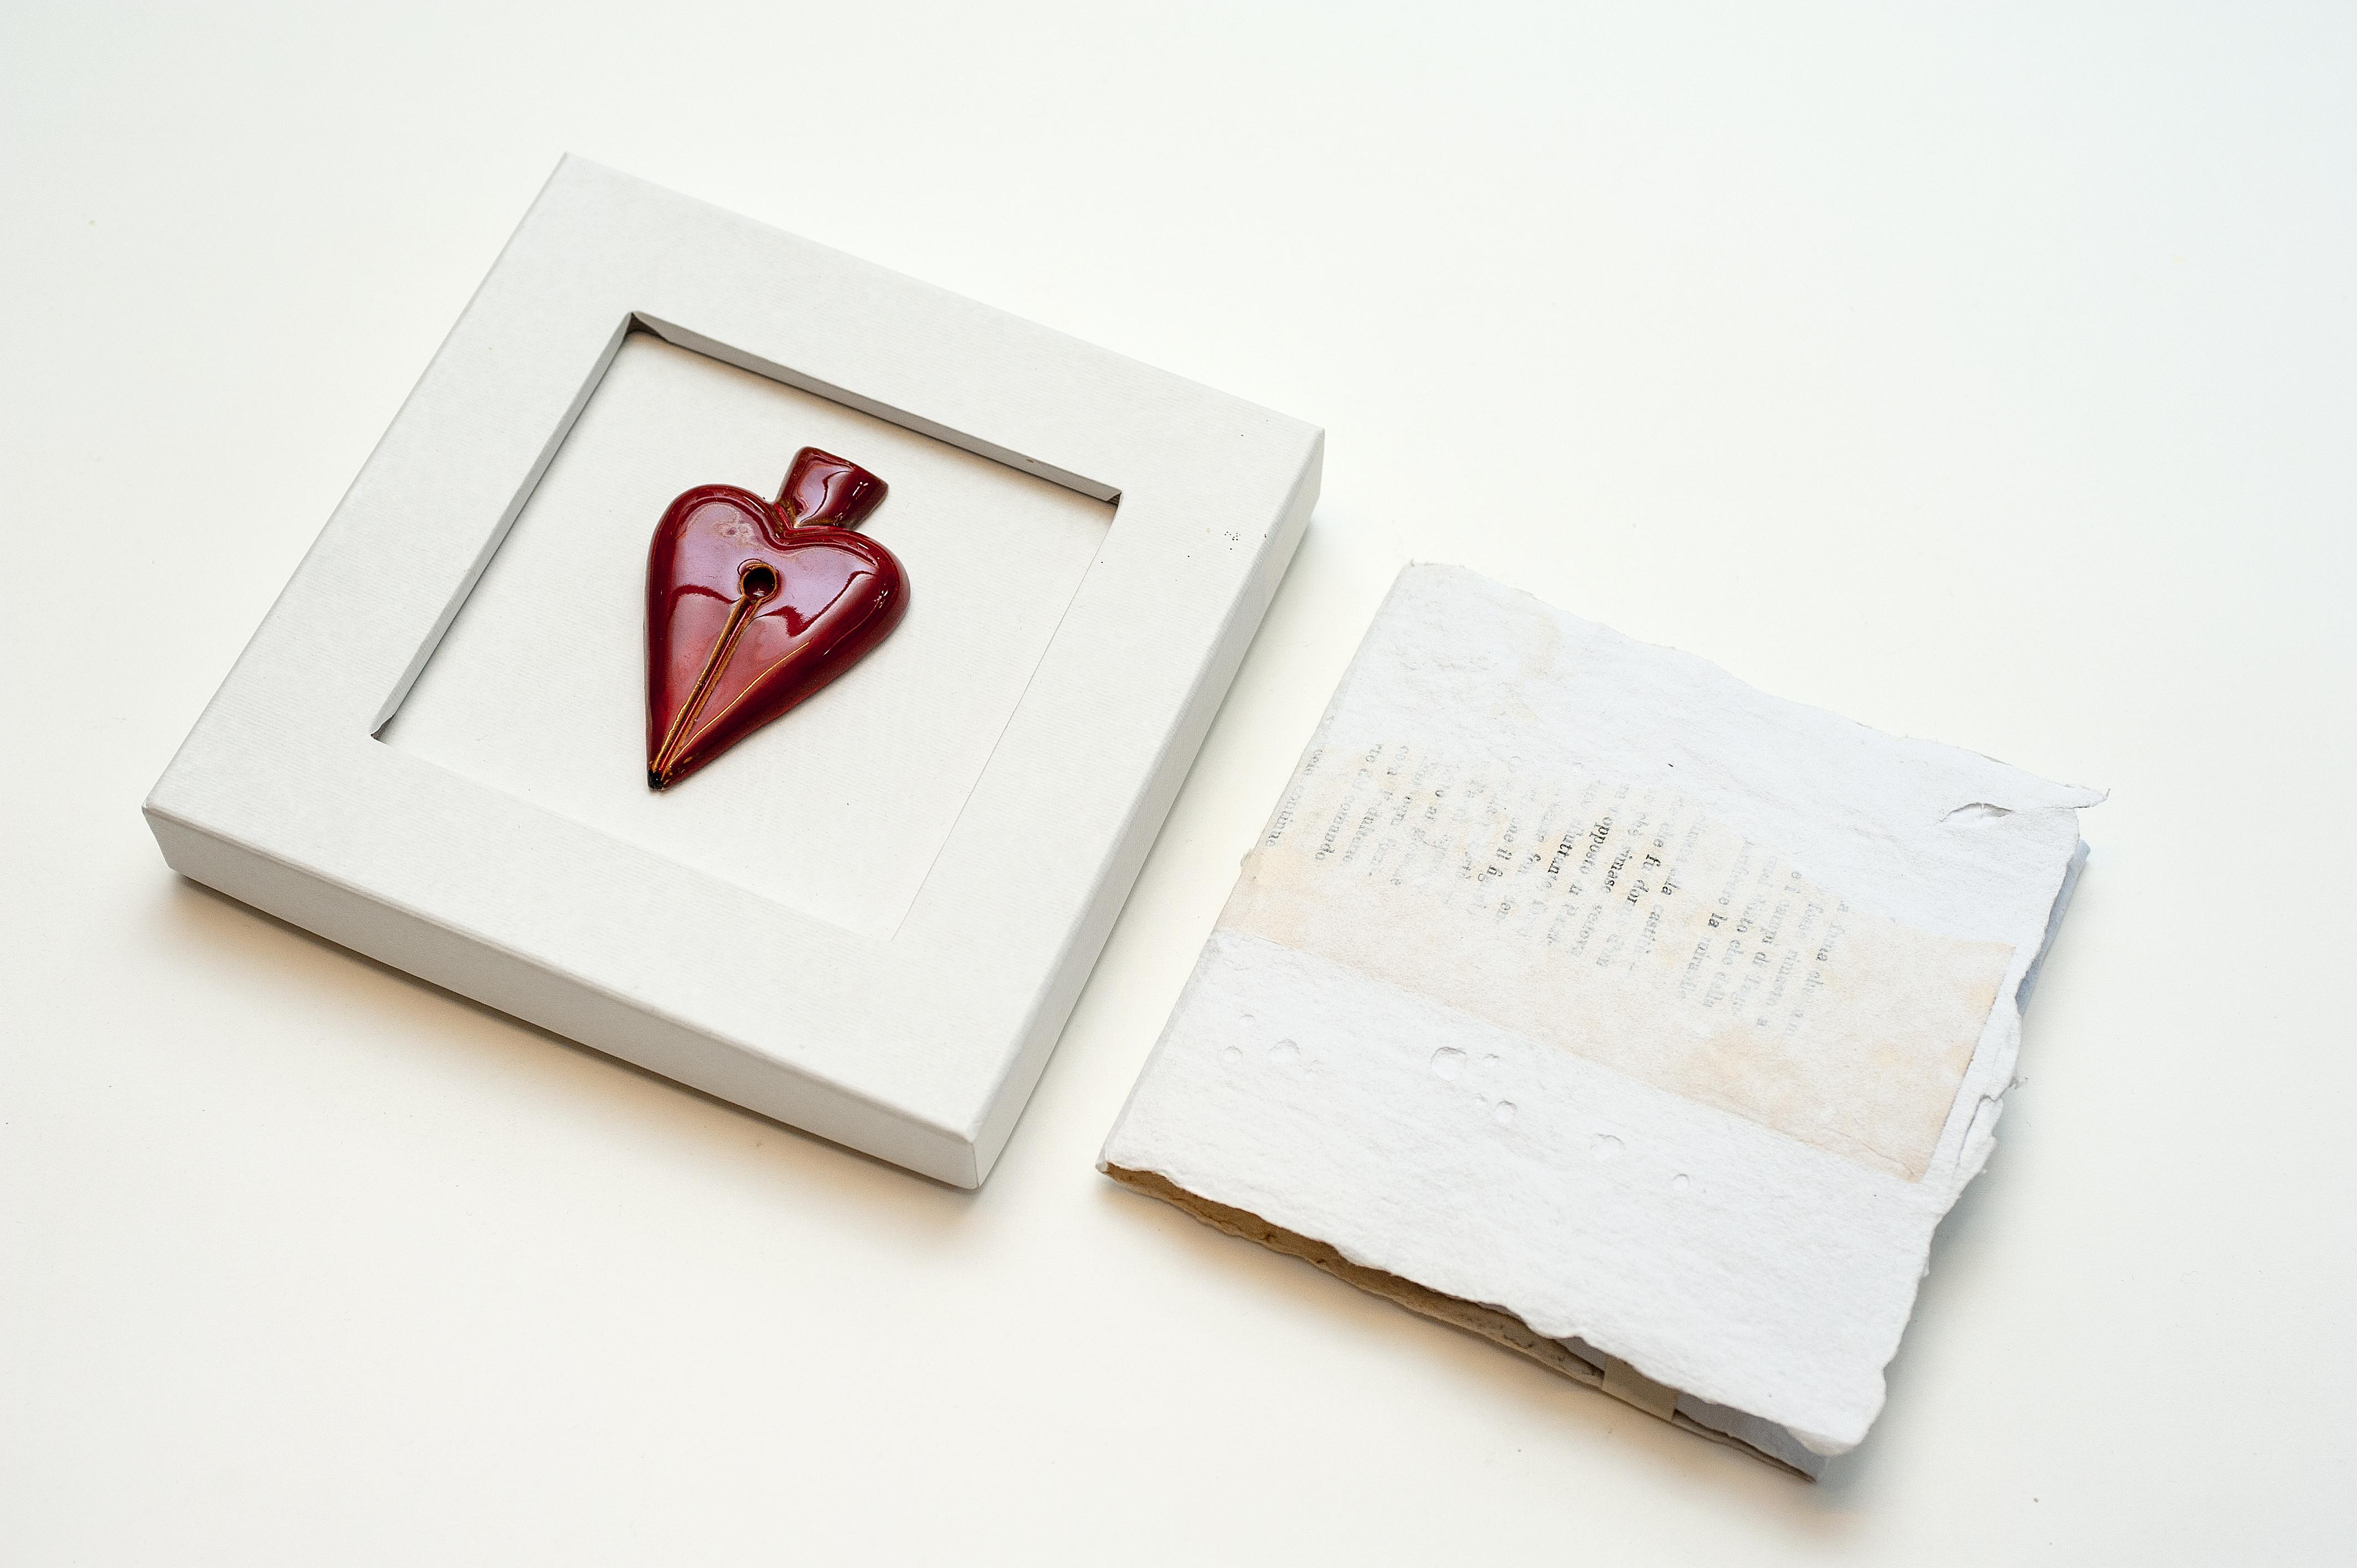 12 volte la carta - Valerio Magrelli